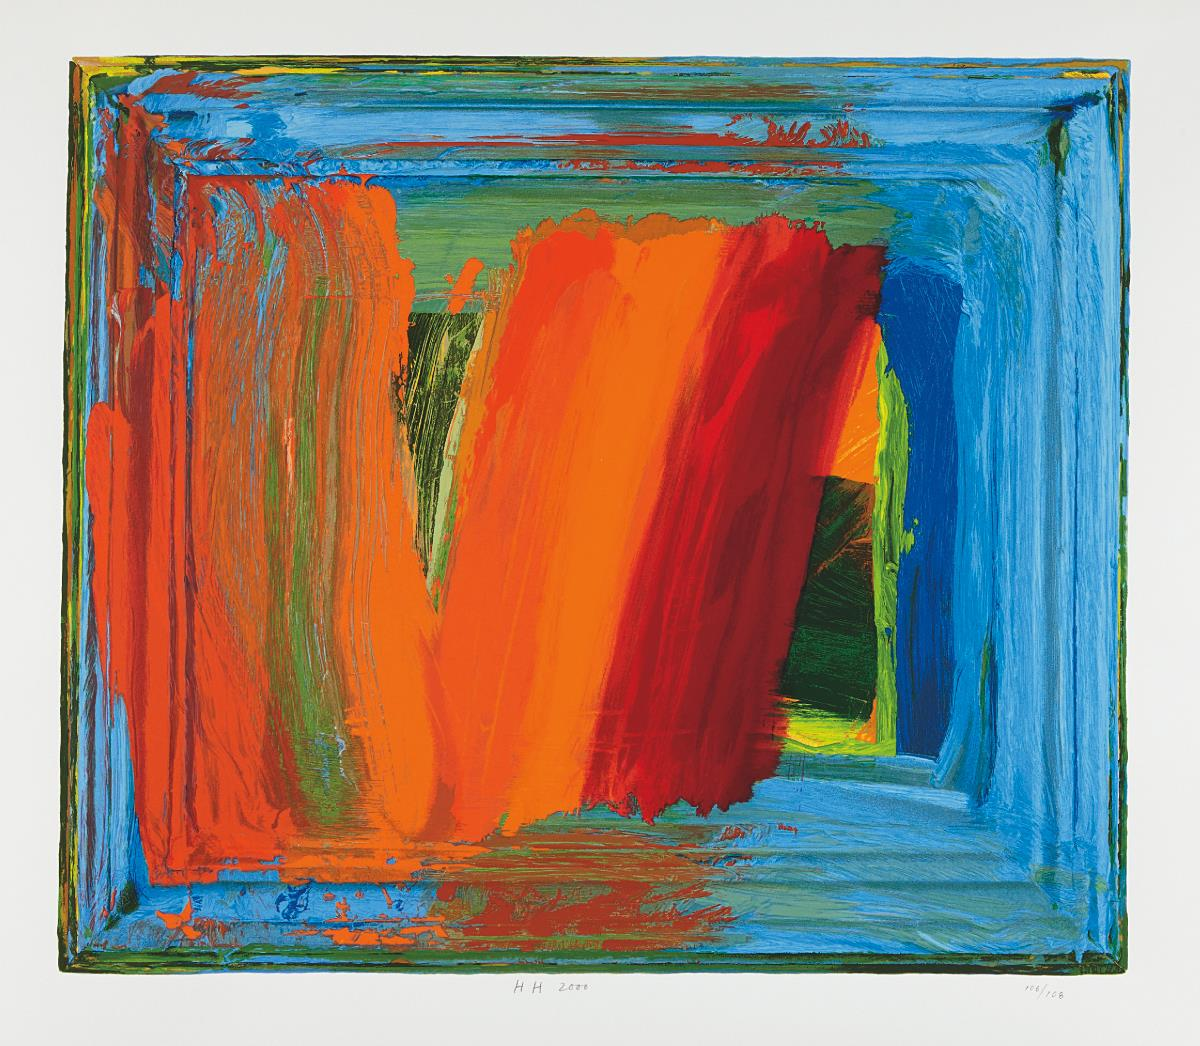 Howard Hodgkin-Bamboo-2000